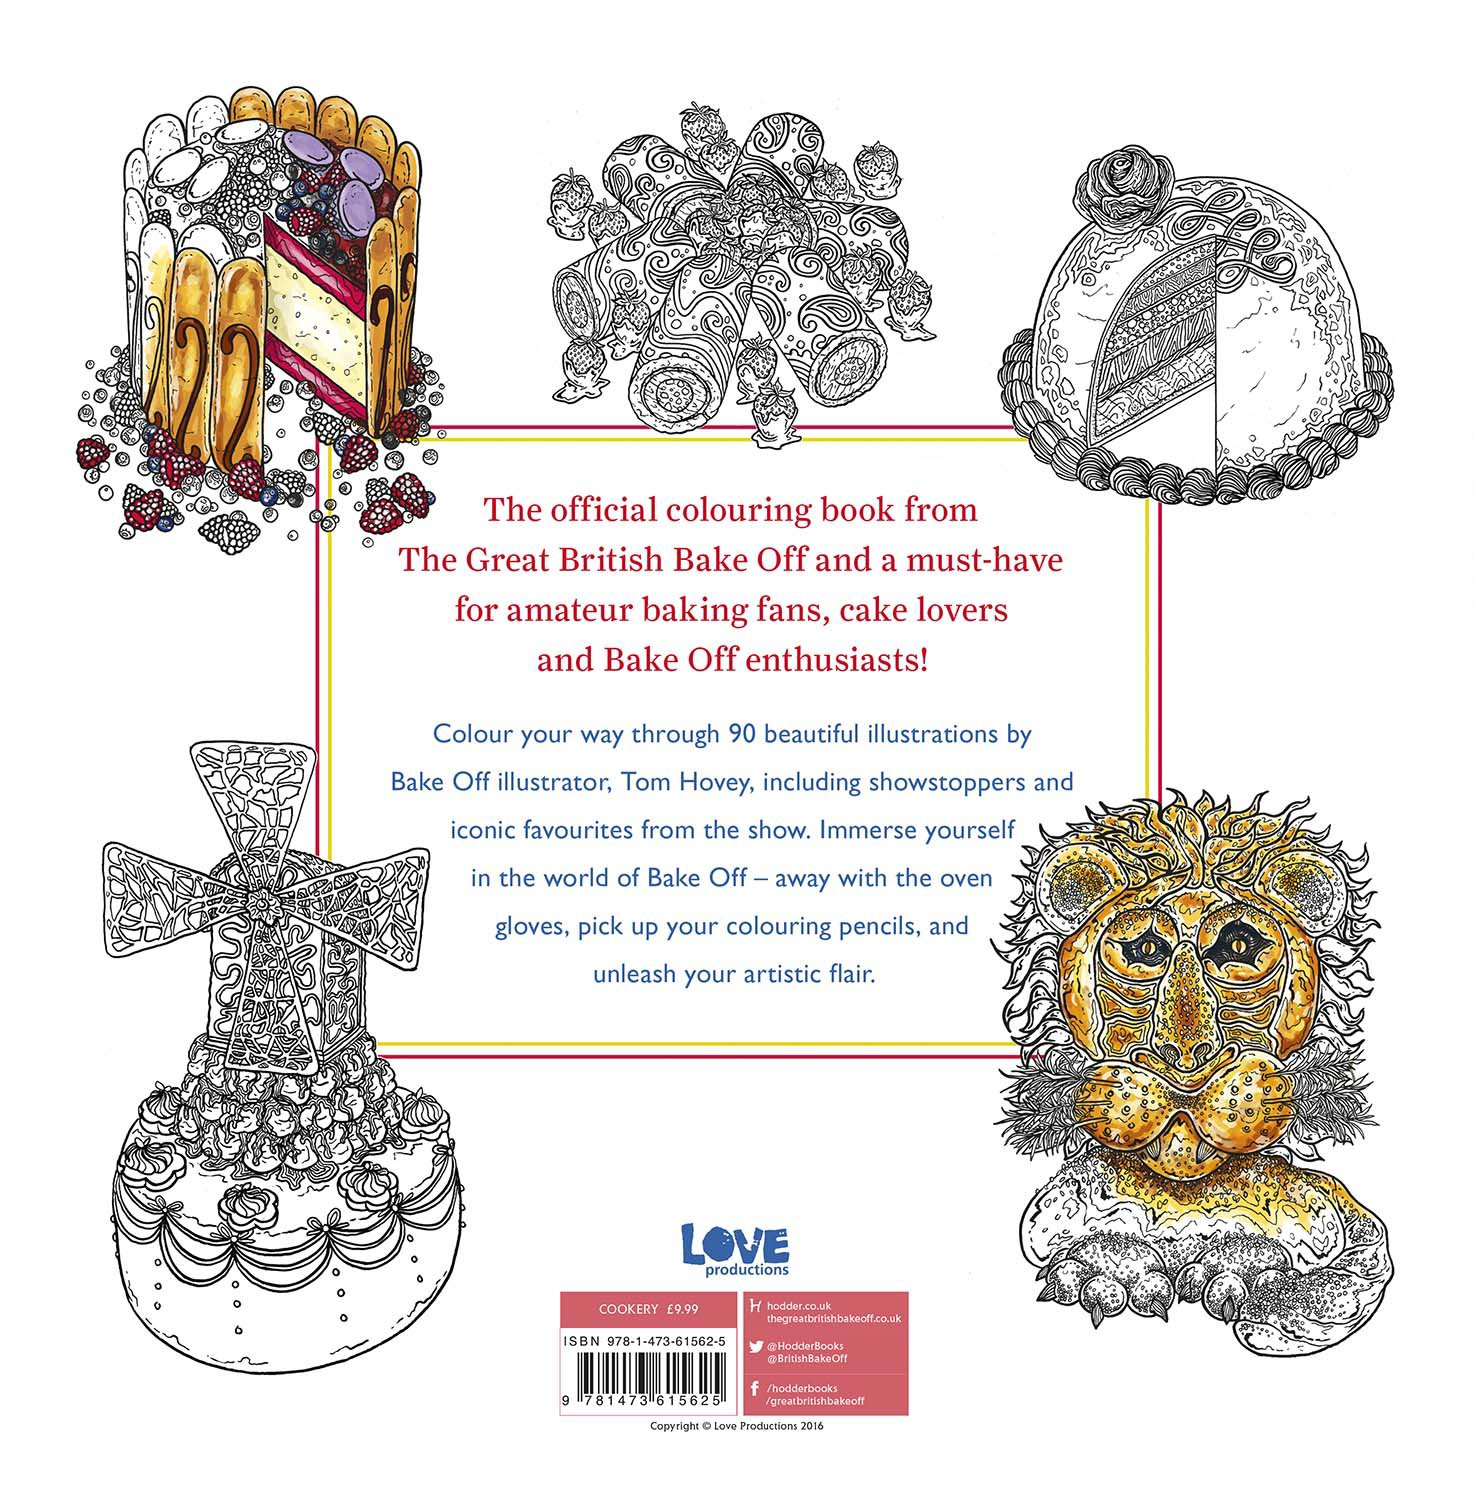 amazon com great british bake off colouring book 9781473615625